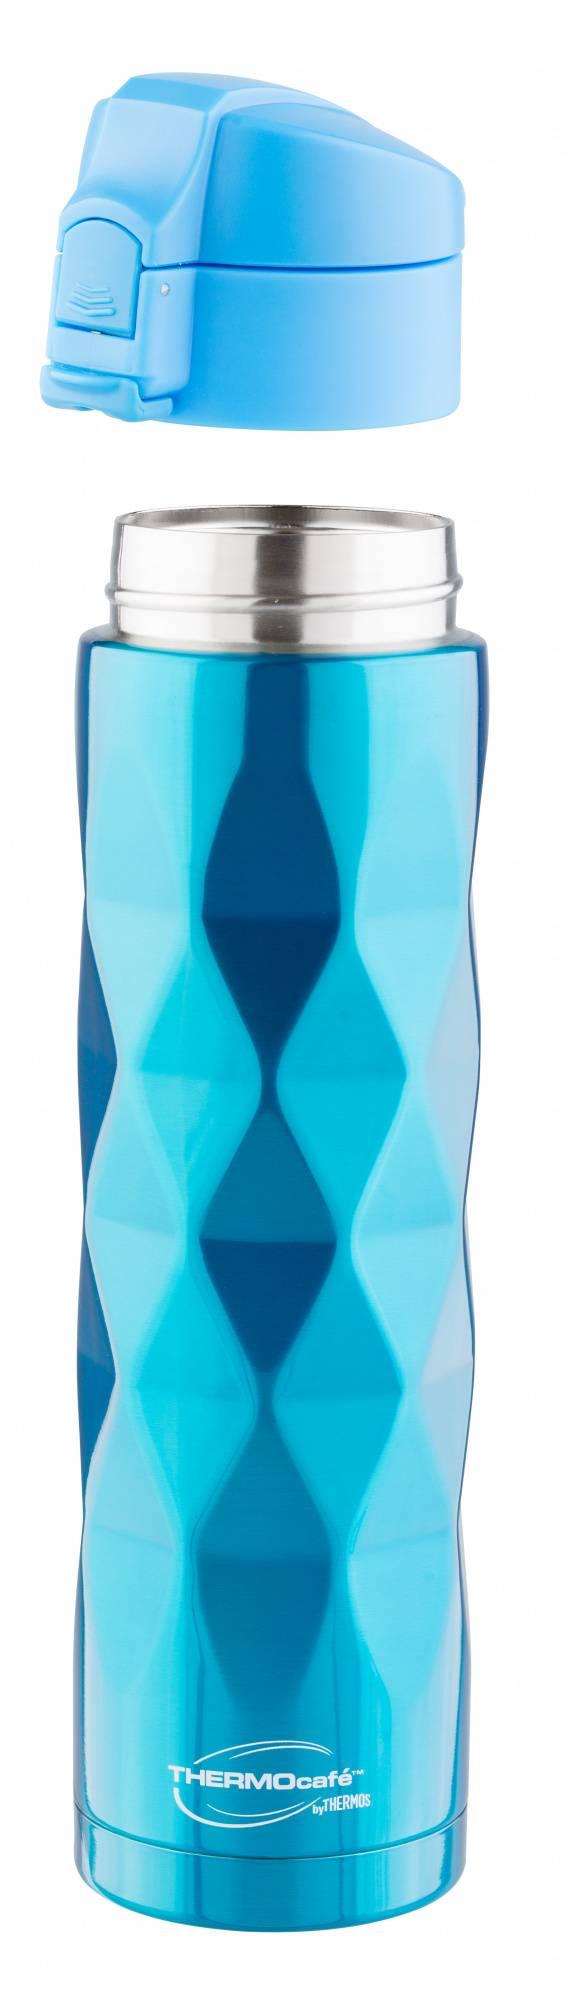 Термос Thermos THERMOcafe TTF-503-B синий (272782) - фото 2